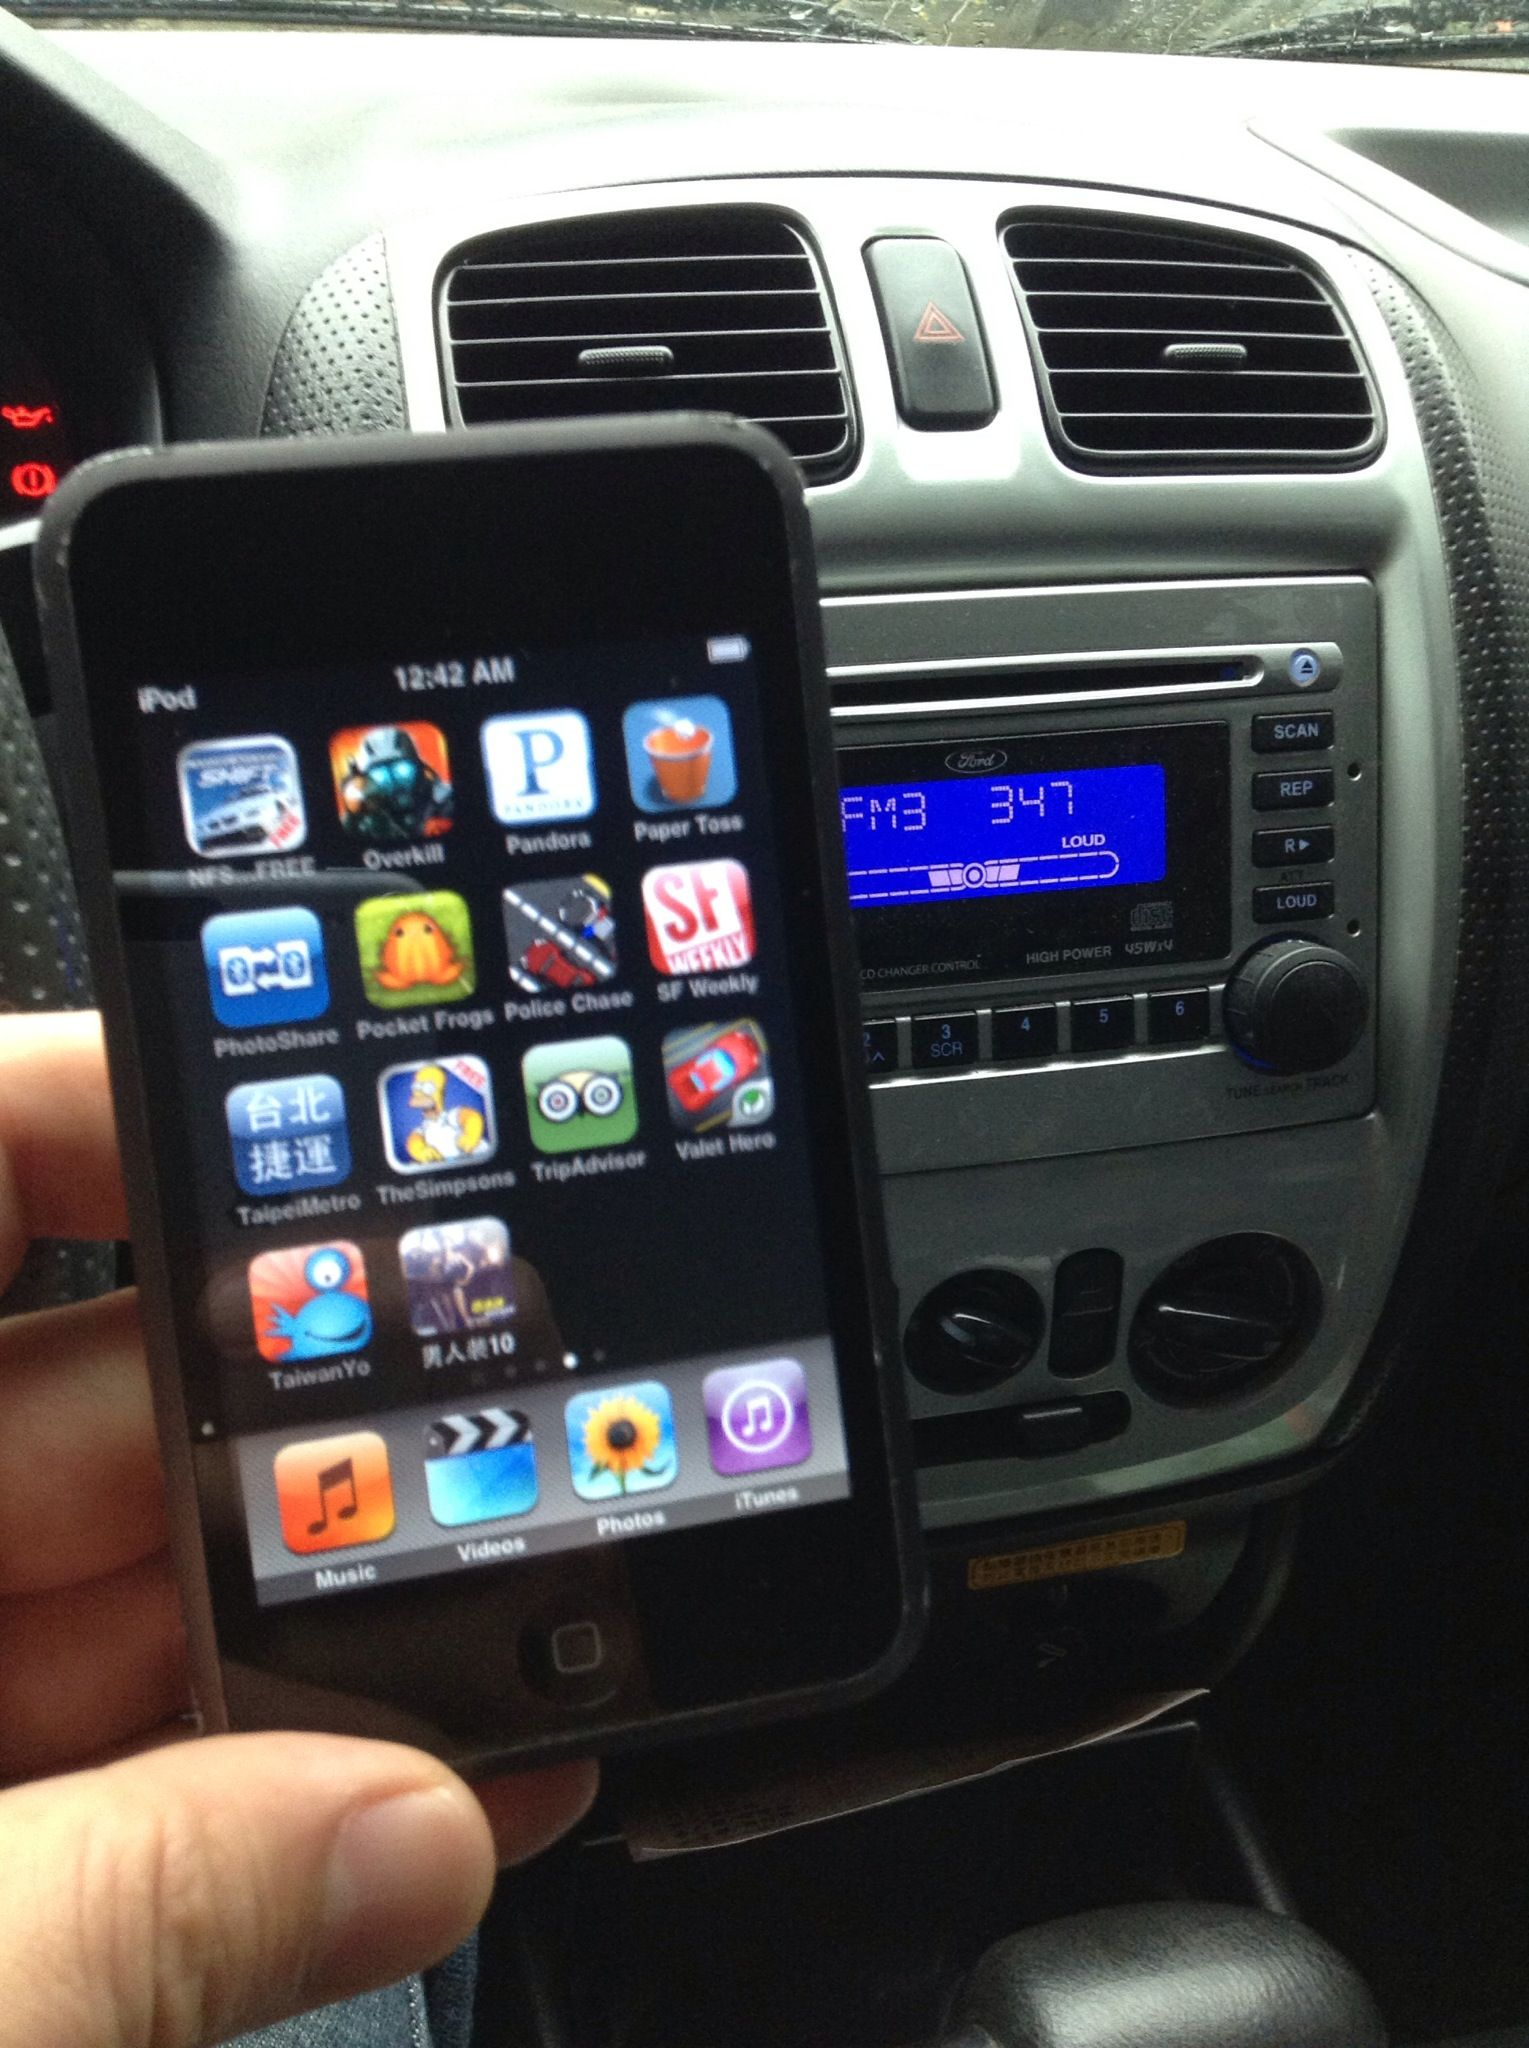 How To Hook Up Ipod To Car Radio Wirelessly No Bluetooth Recipe Radio Car Radio Fm Radio